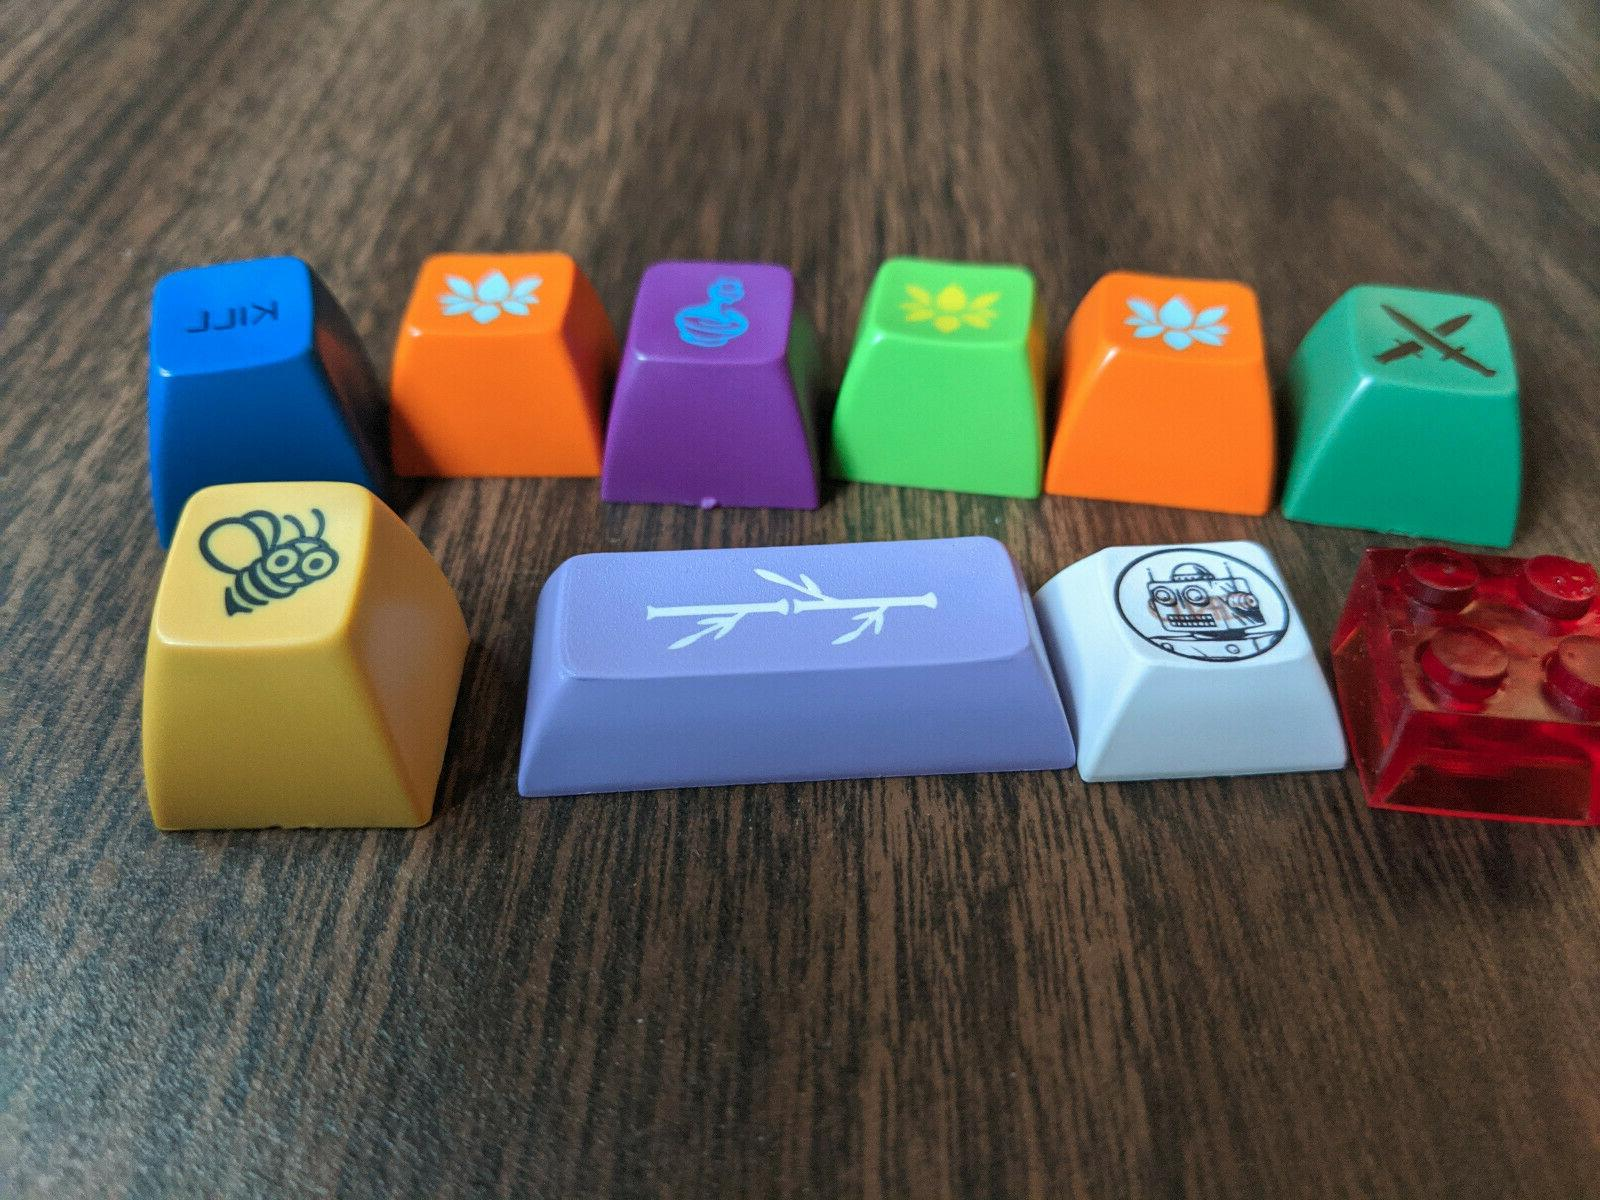 Grab SA Cherry? keyboard keys